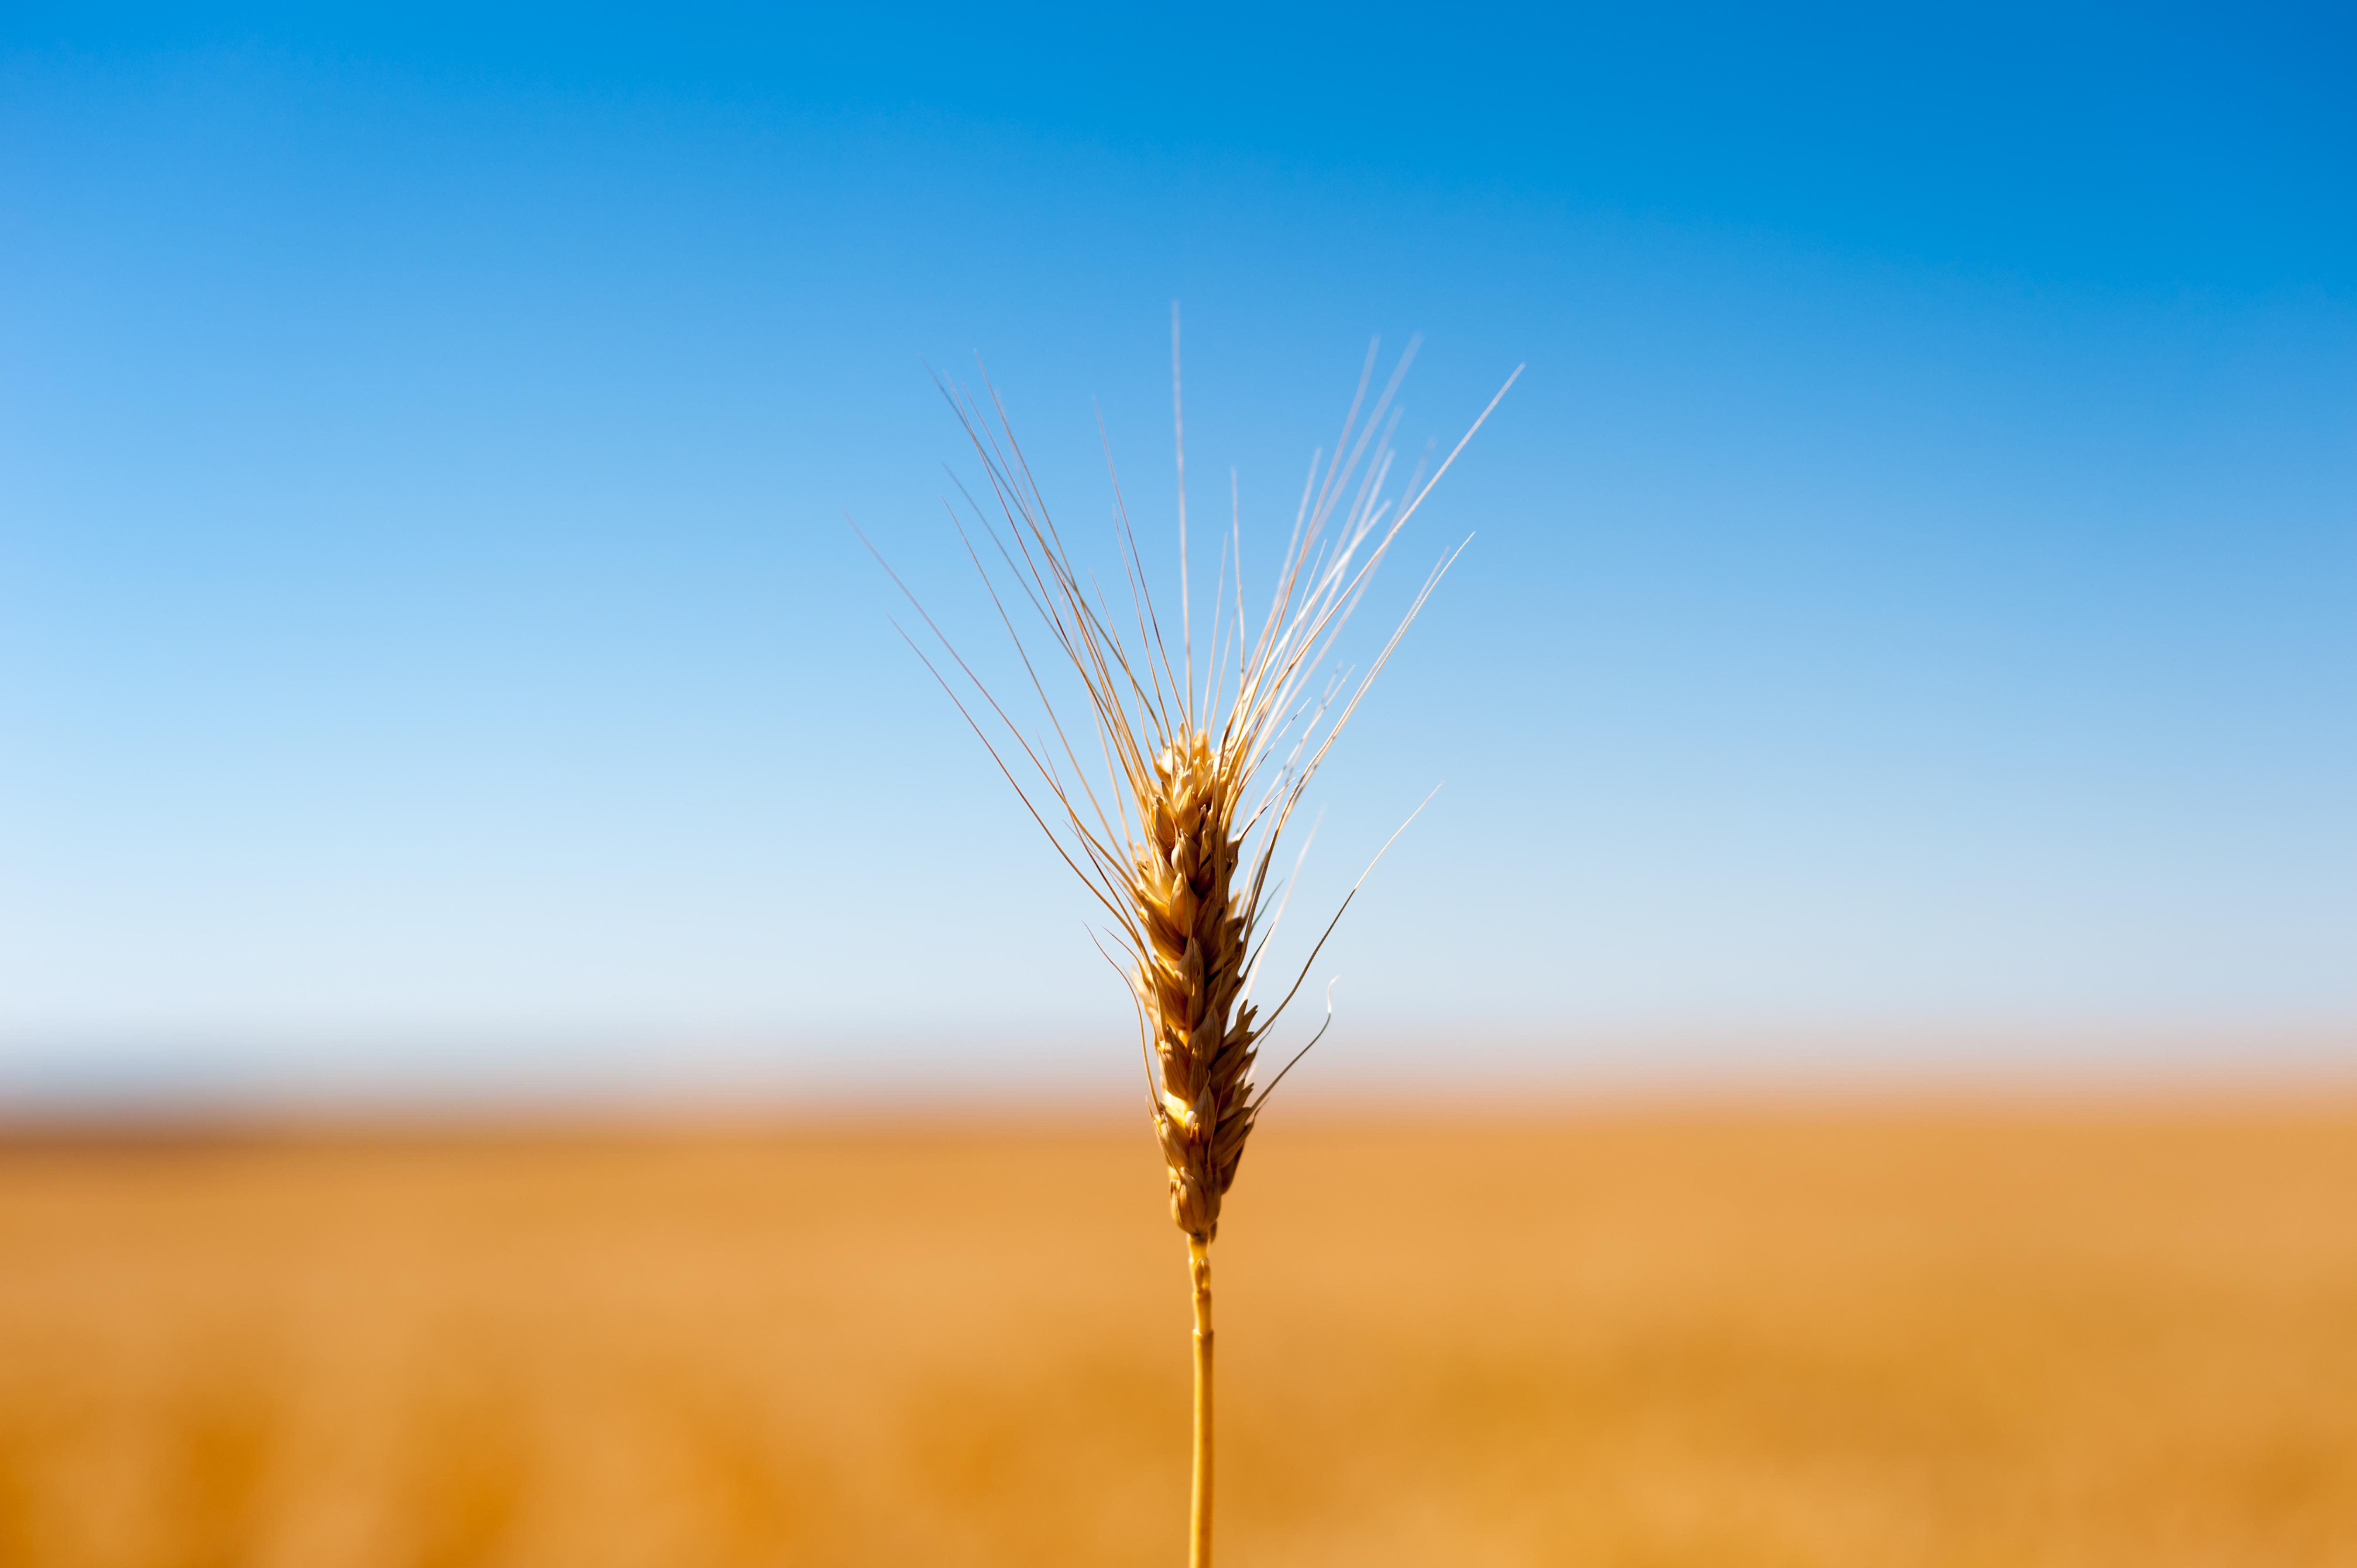 grain of life